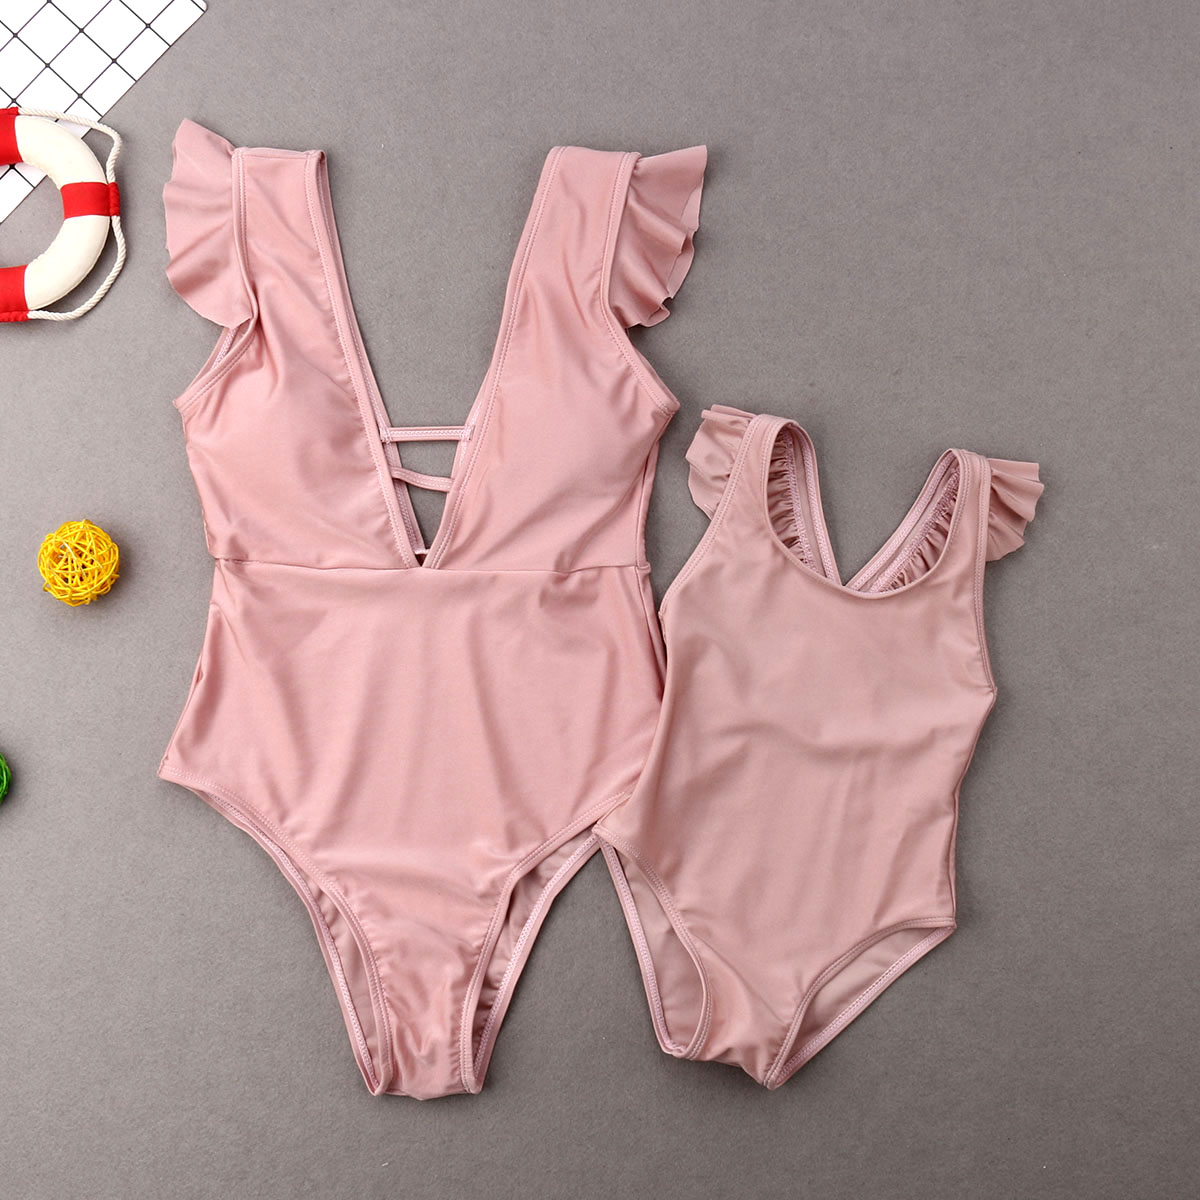 New Family Matching Swimwear Mother Daughter Women Kids Holiday Beach Solid Bodysuit